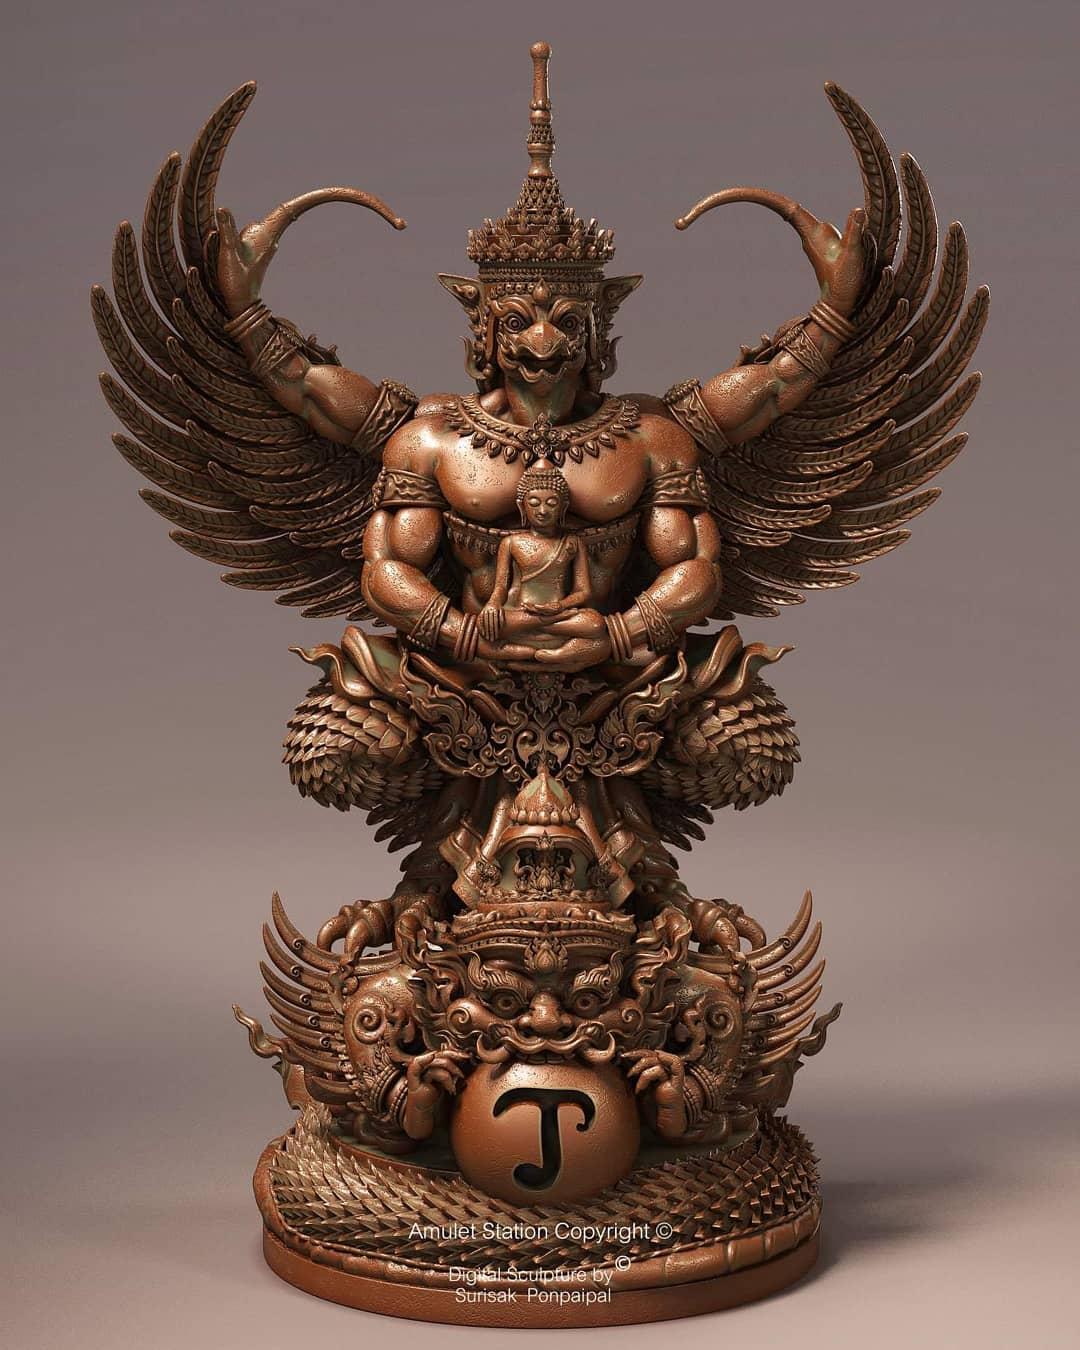 3d model buddha sculputre by midhun surisak